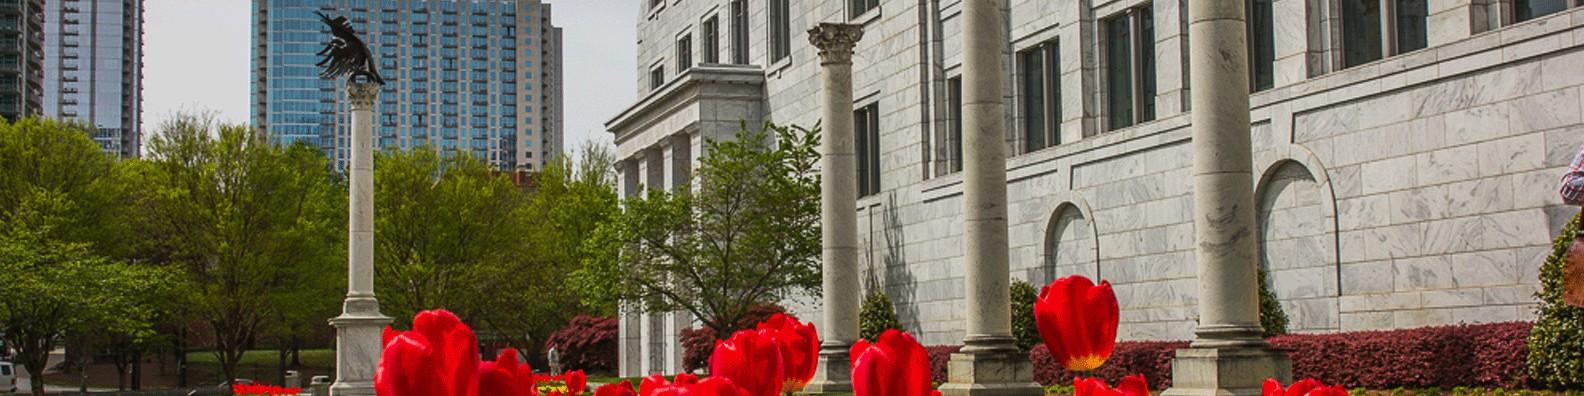 Federal Reserve Bank of Atlanta | LinkedIn